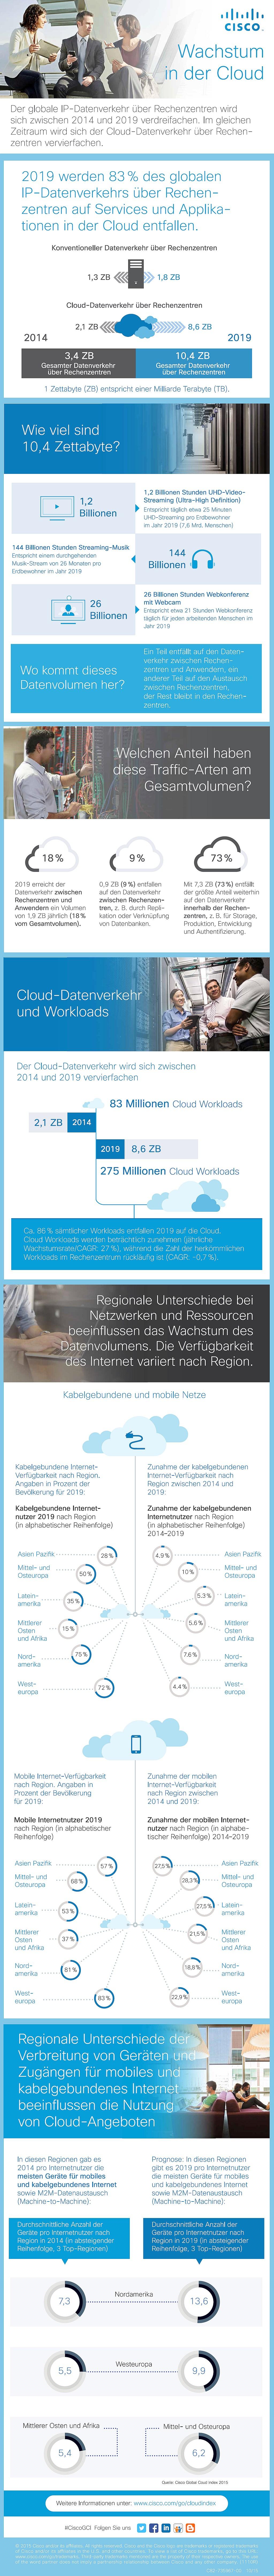 infografik cisco cloud rz datenverkehr